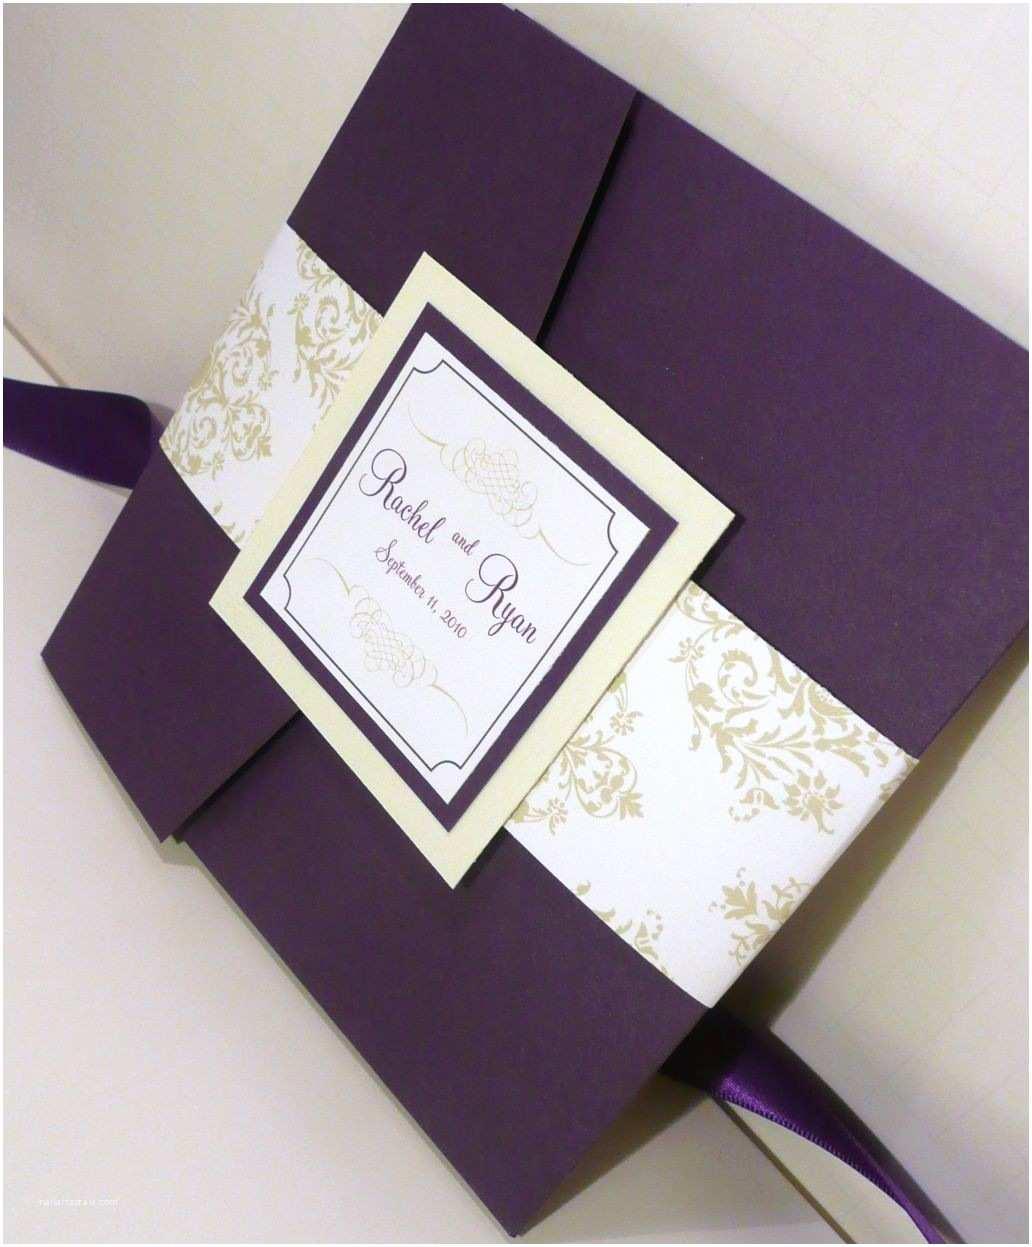 Wedding Invitation Content Party Invitation Envelopes for Wedding Invites In White